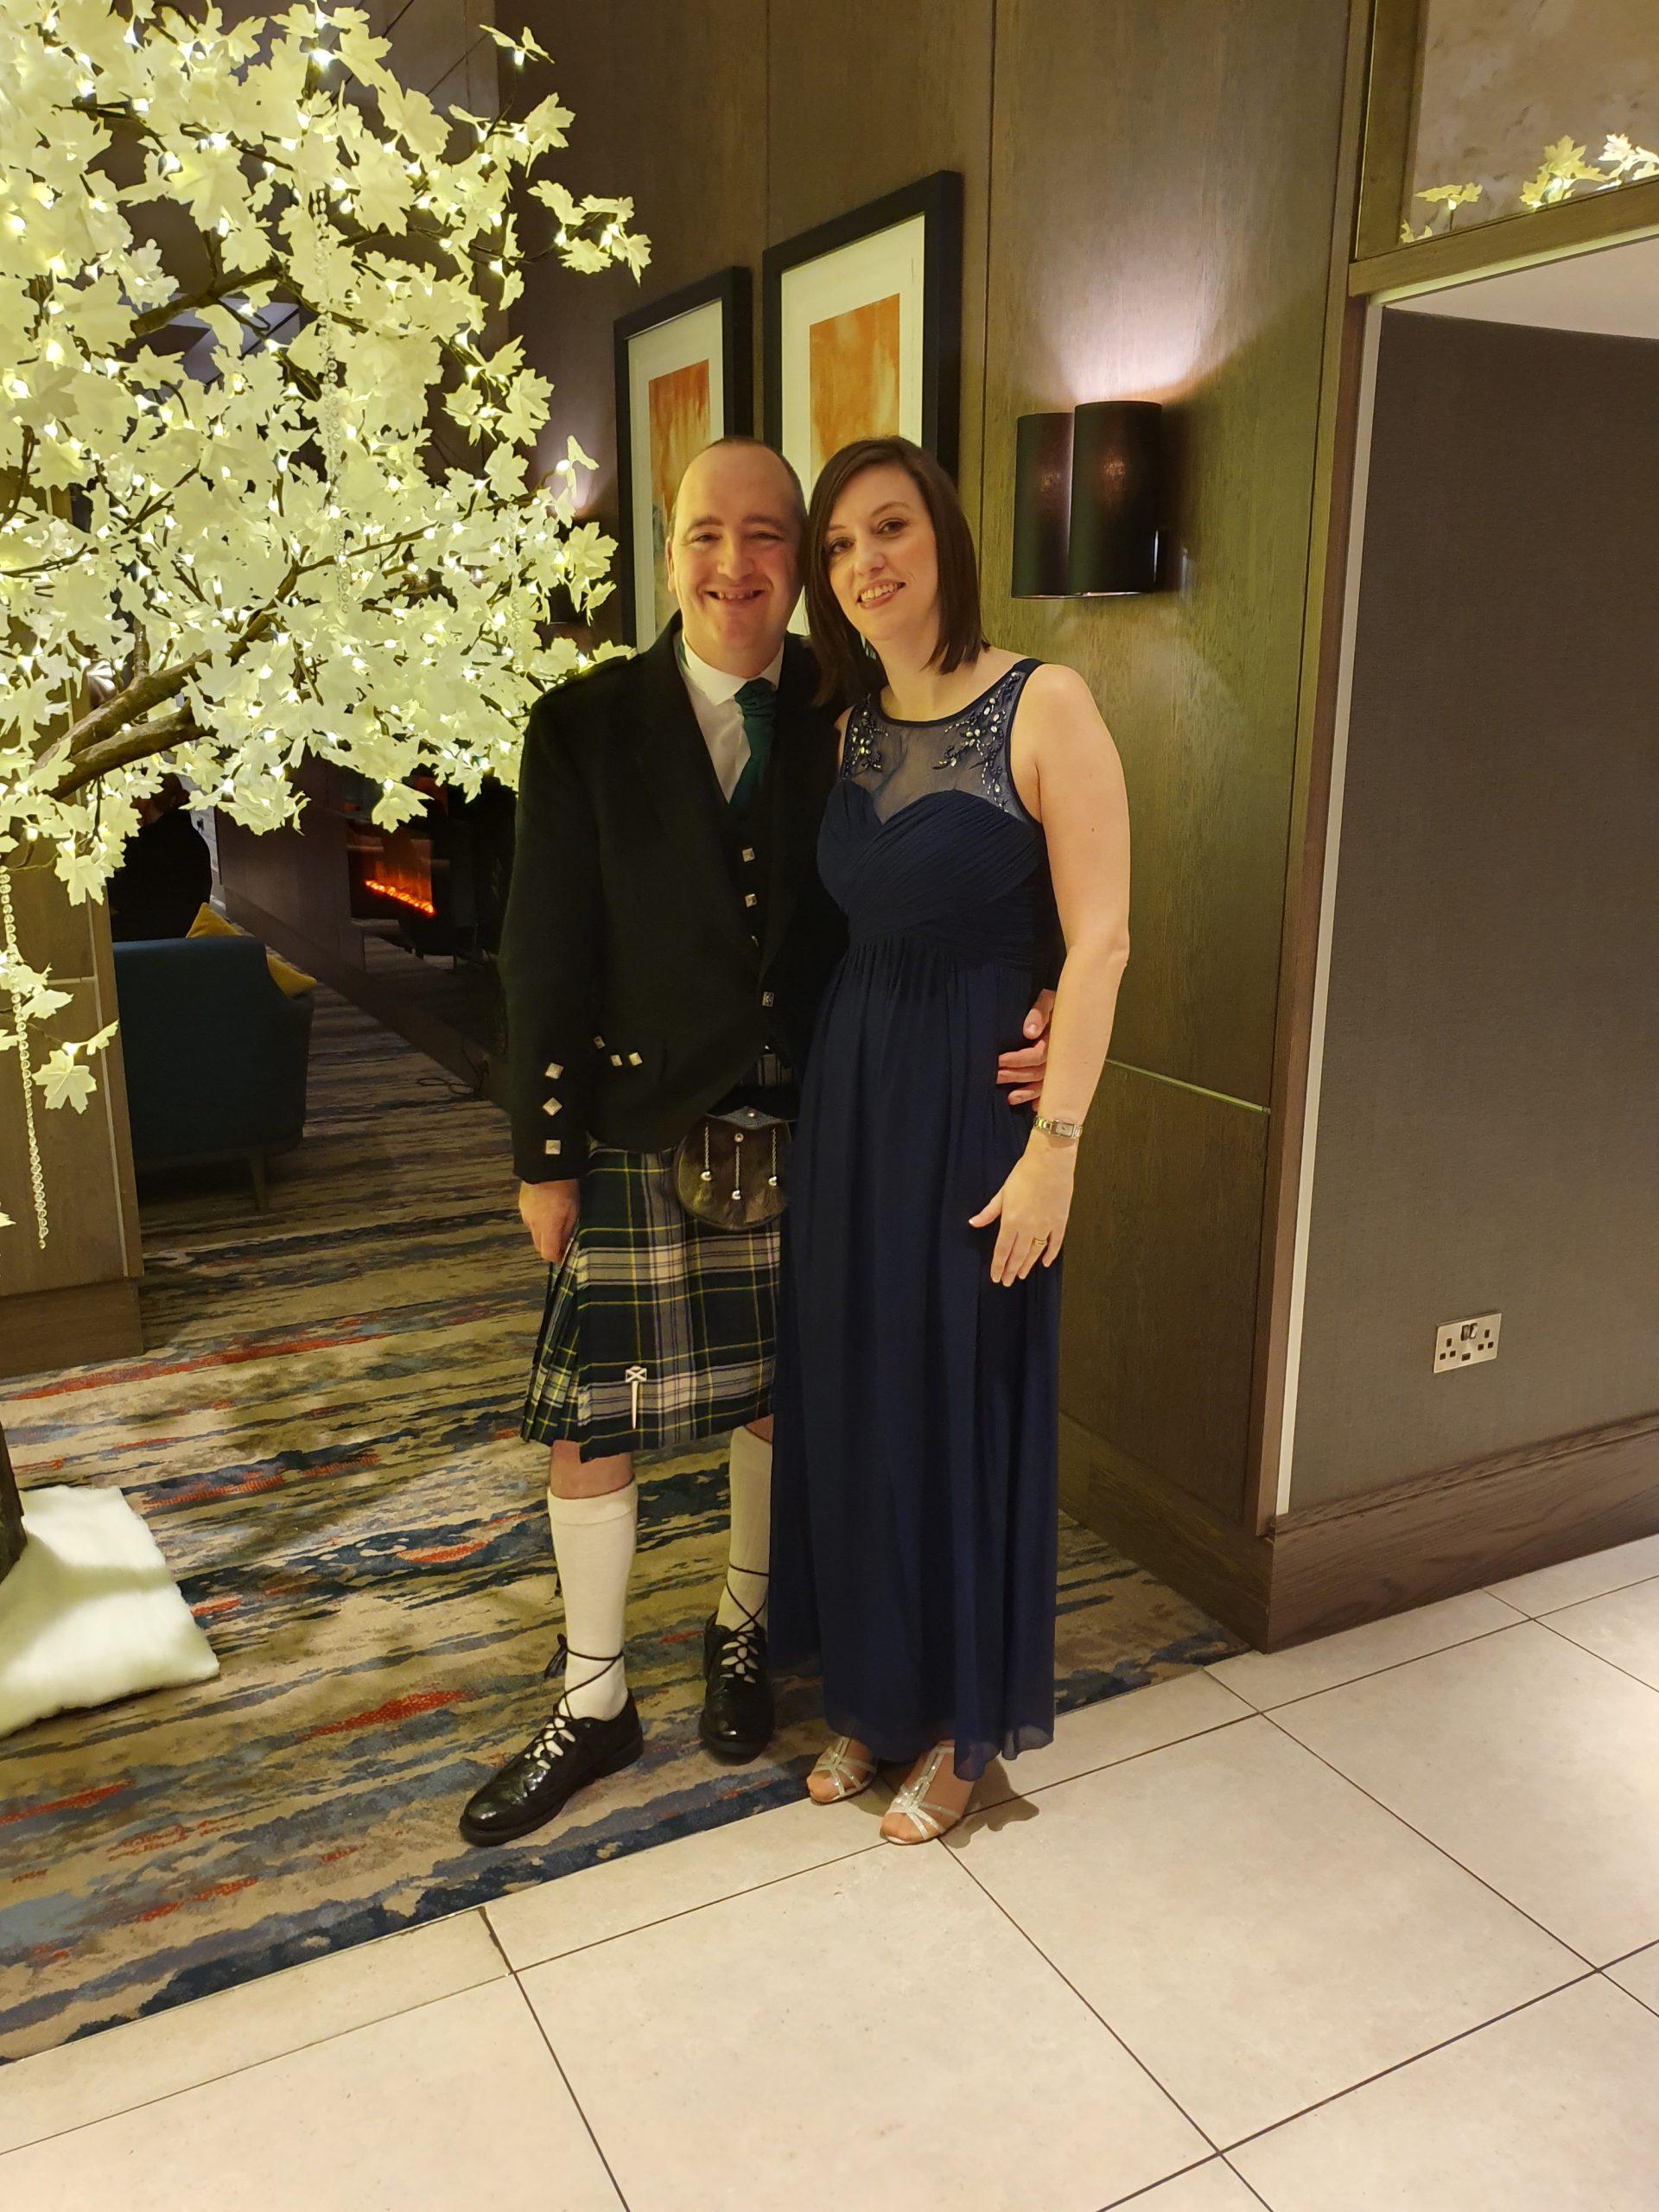 Scottish VOWS Award Winners, Gordy Is A DJ, Gordy and Emma.